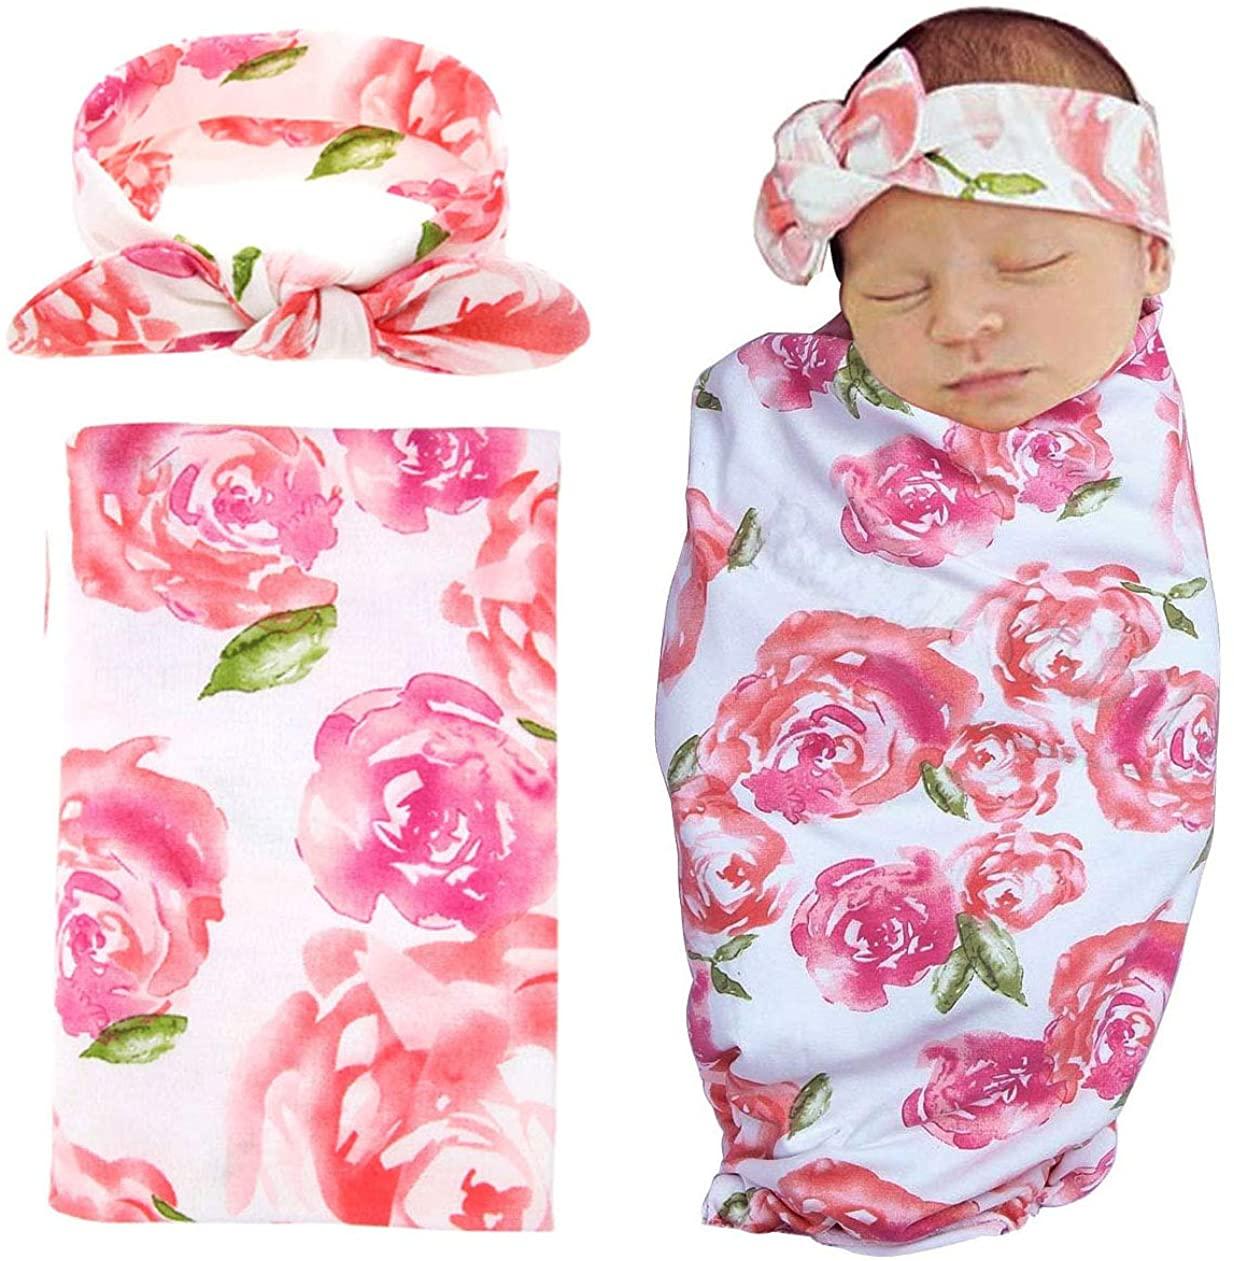 Swaddle Sack,Newborn Baby Boys Girls Sleep Blanket with Bow Headband Set Infants Receiving Blankets